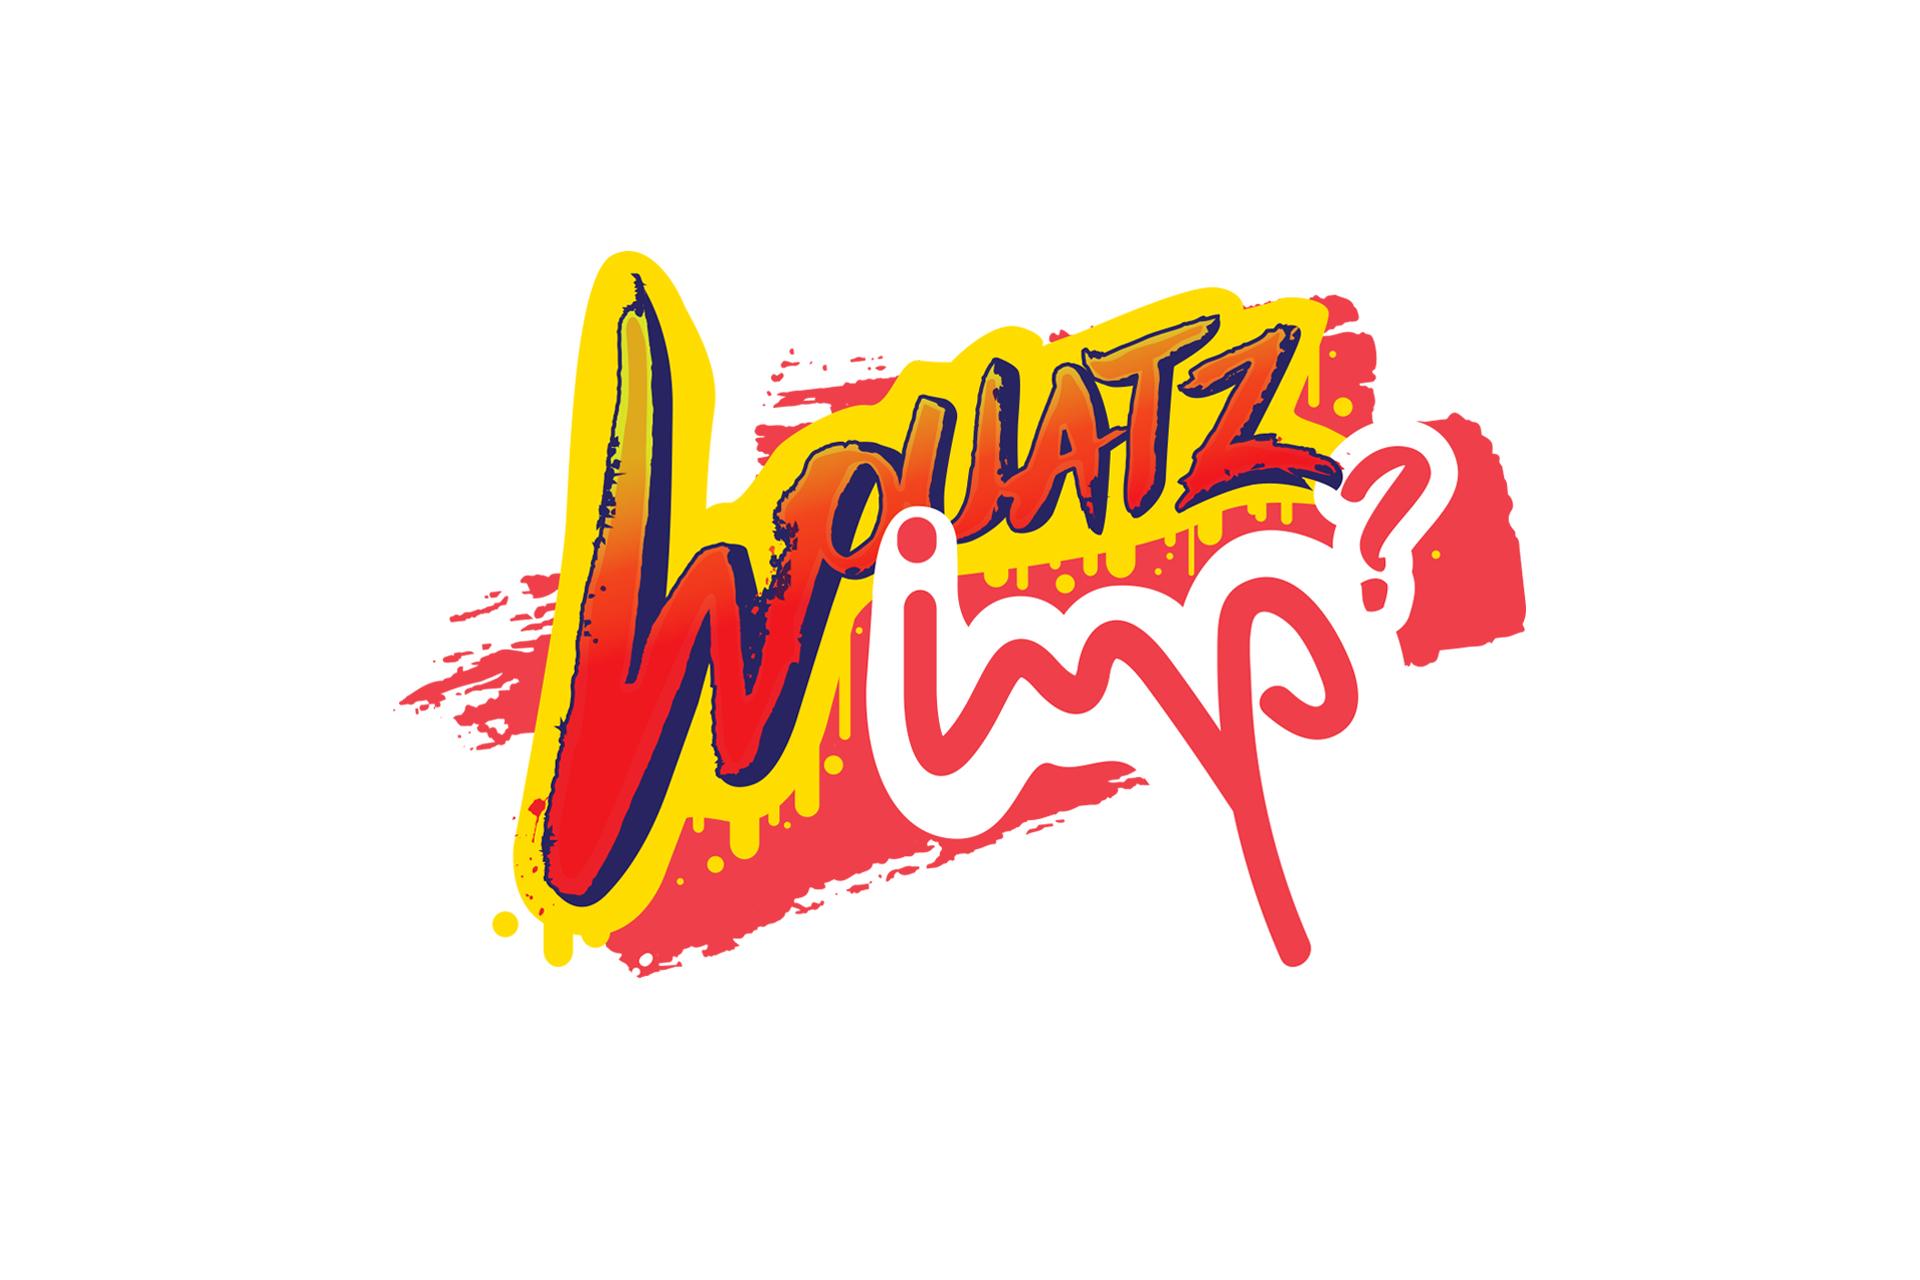 logotype Wouatz imp